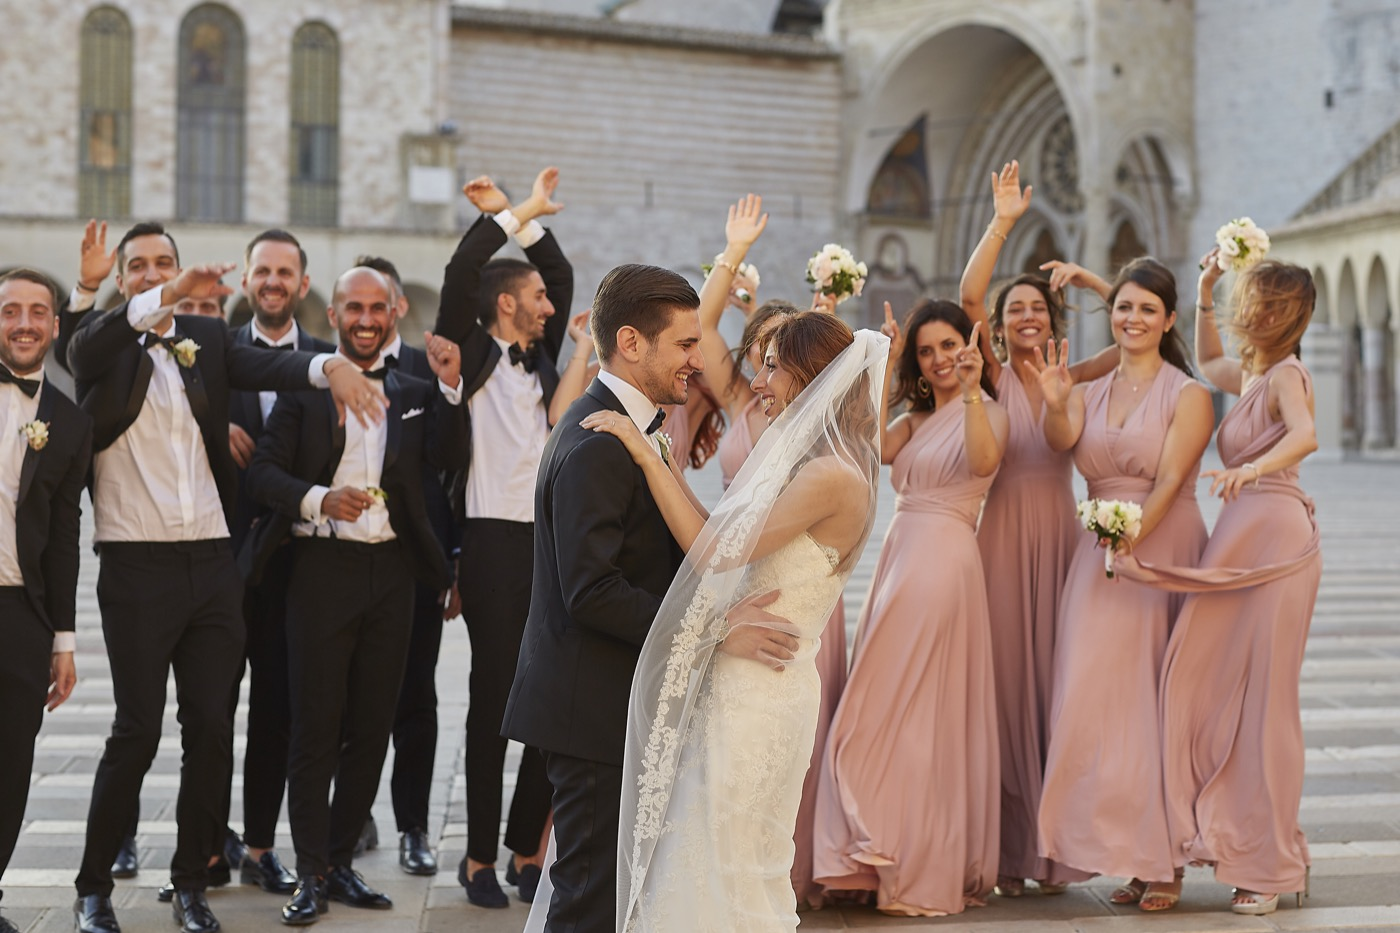 Claudio-Coppola-wedding-photographer-abbazia-7-frati-piegaro-77